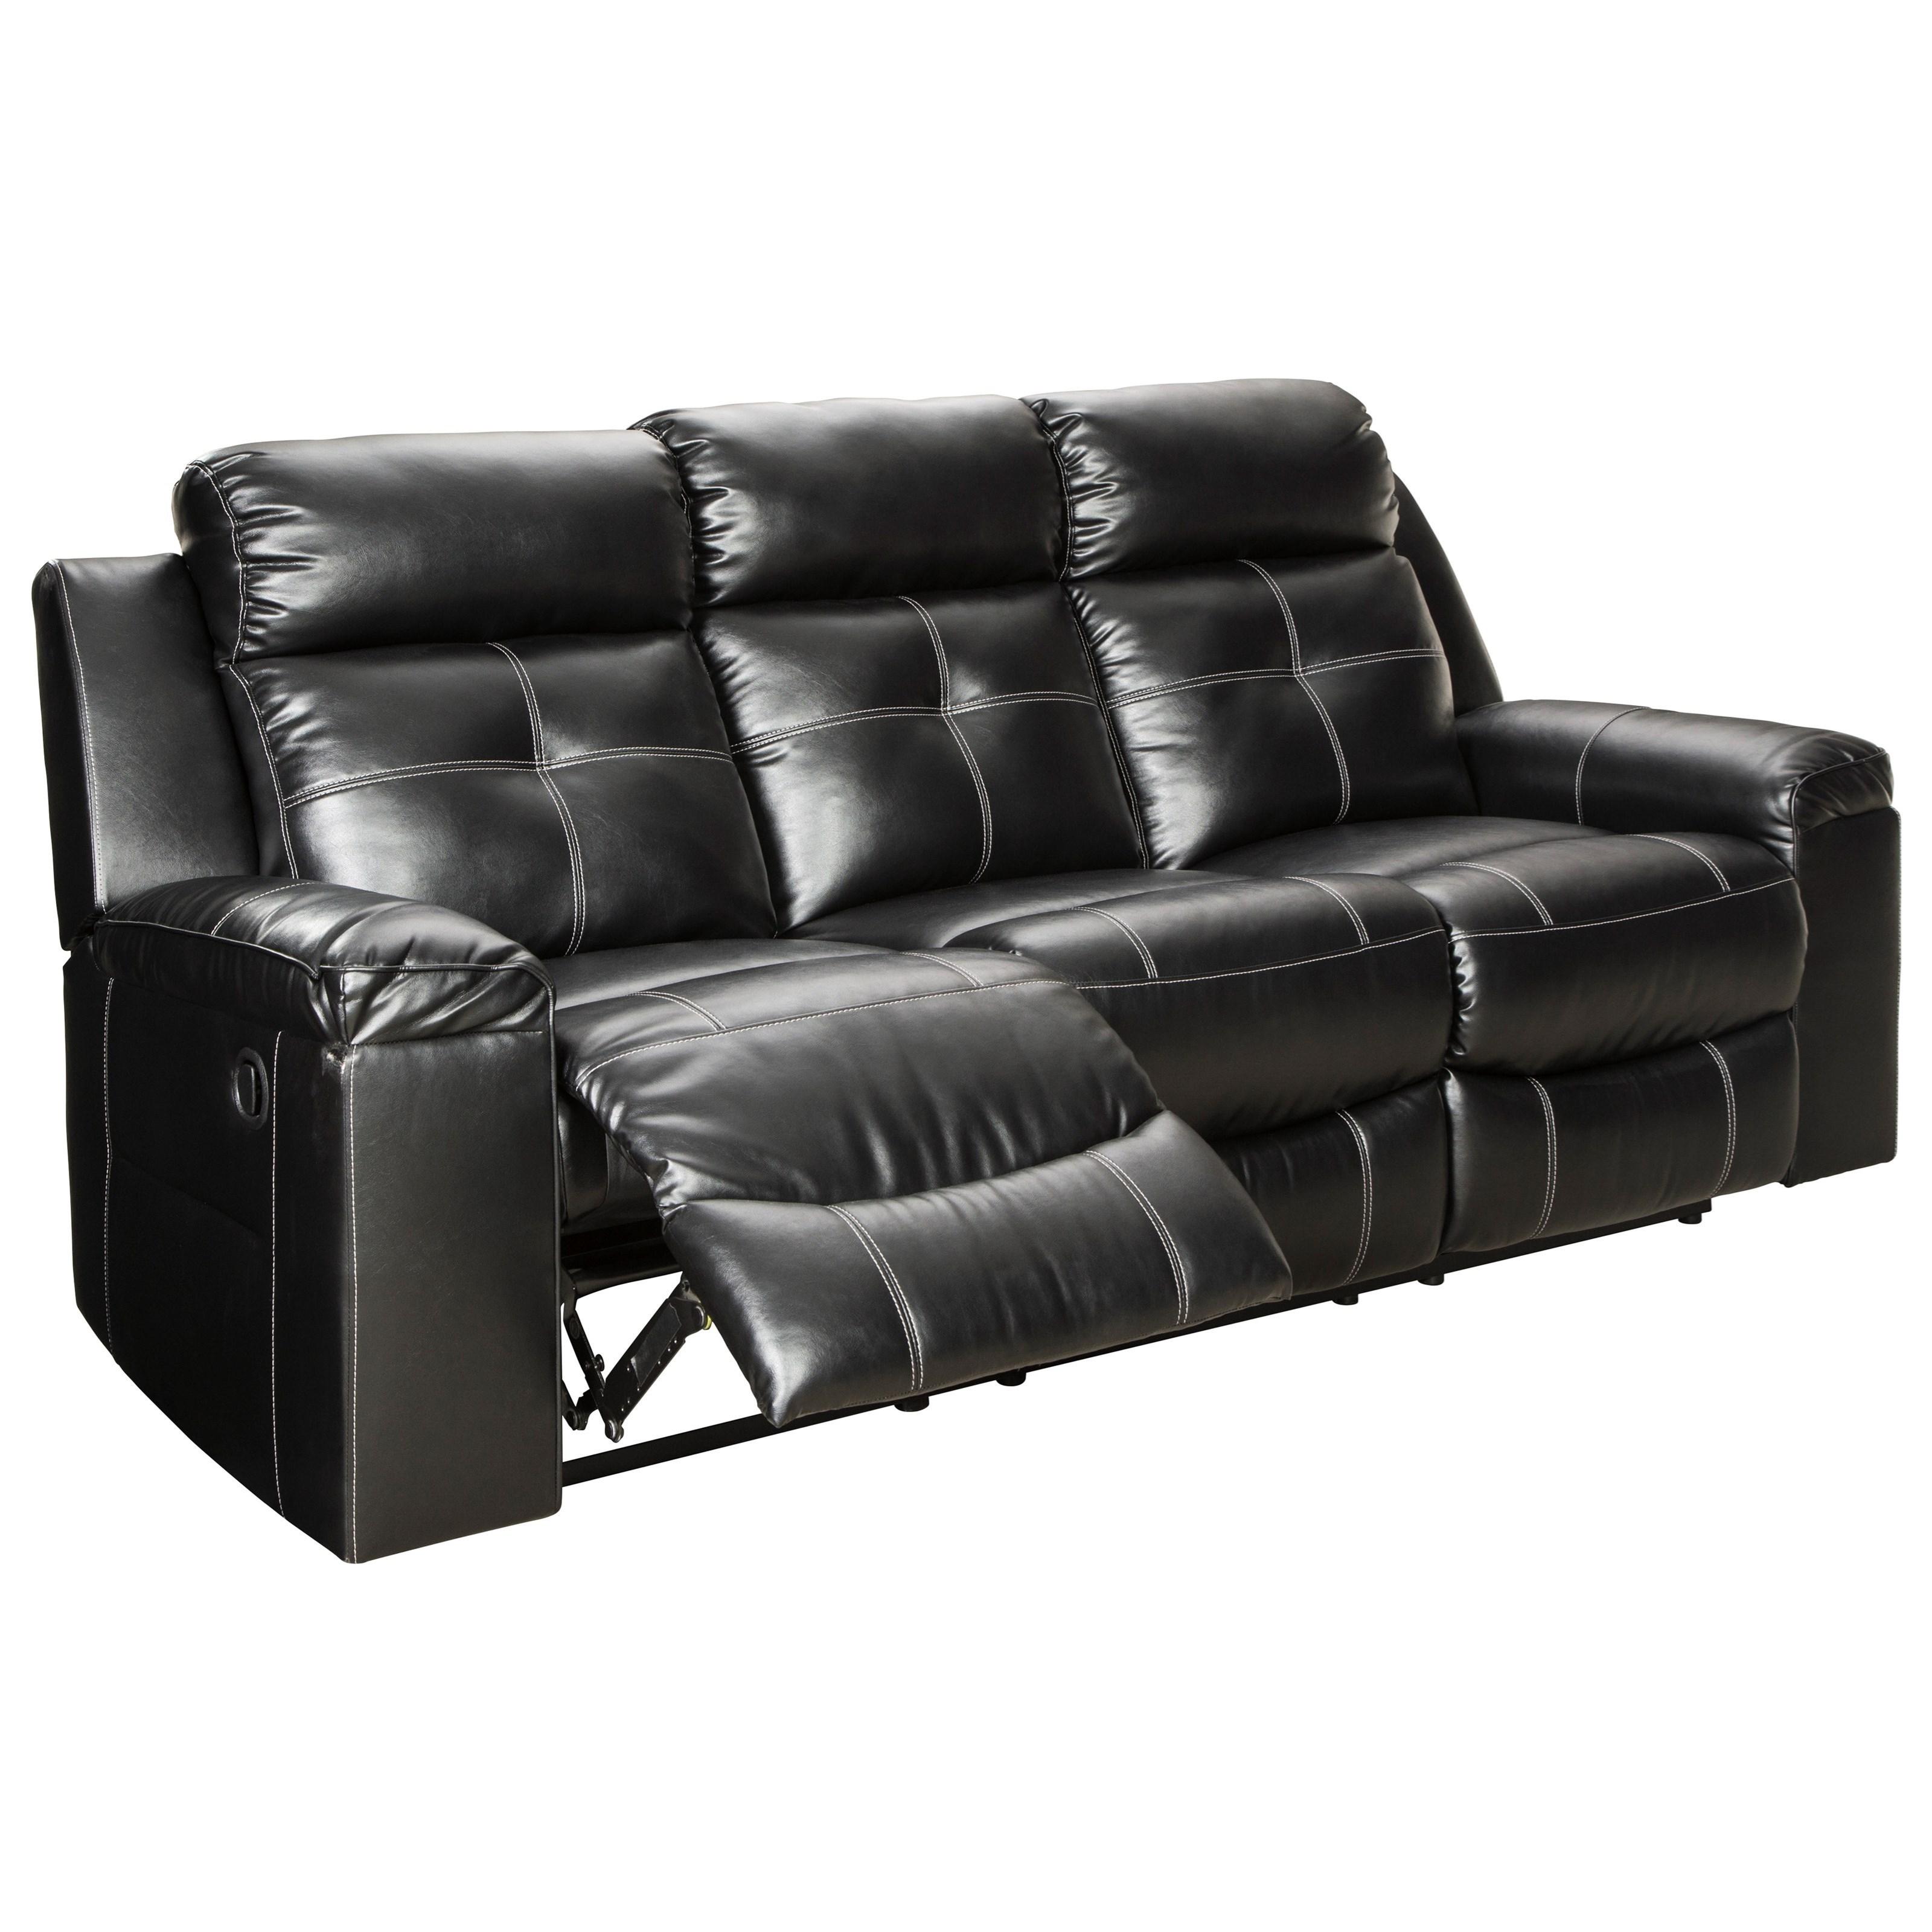 Ordinaire Household Furniture